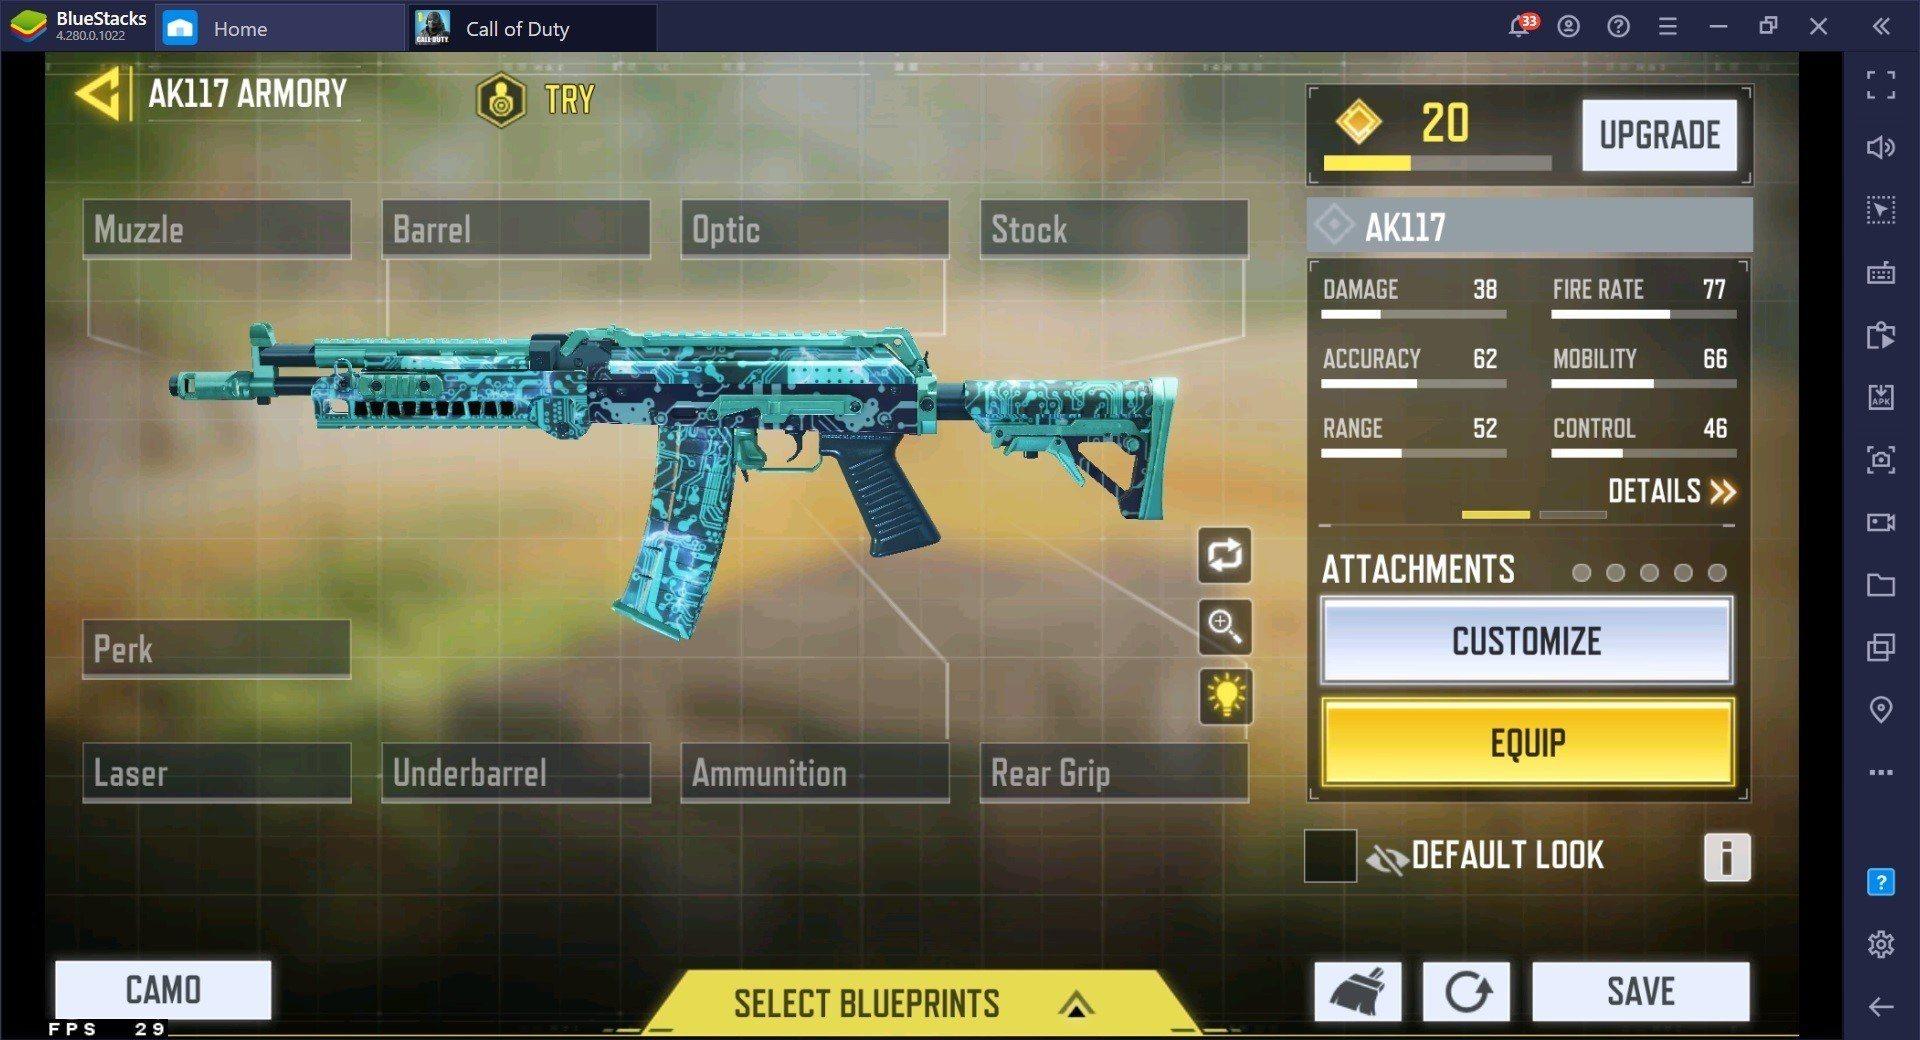 لعبة Call of Duty: Mobile الموسم الرابع دليل السلاح لألعاب Battle Royale